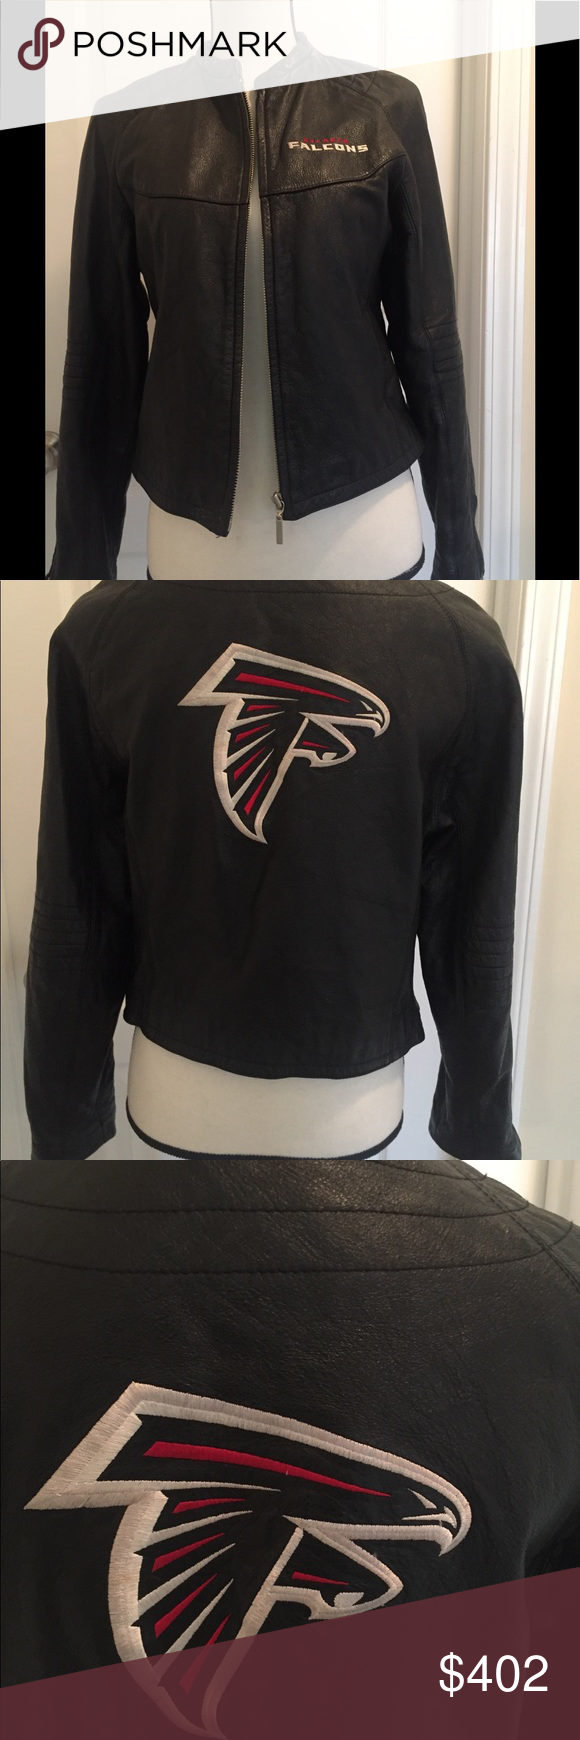 Falcons Nfl Vtg Genuine Leather Reebok Jacket Euc Vintage Leather Jacket Jackets Clothes Design [ 1740 x 580 Pixel ]